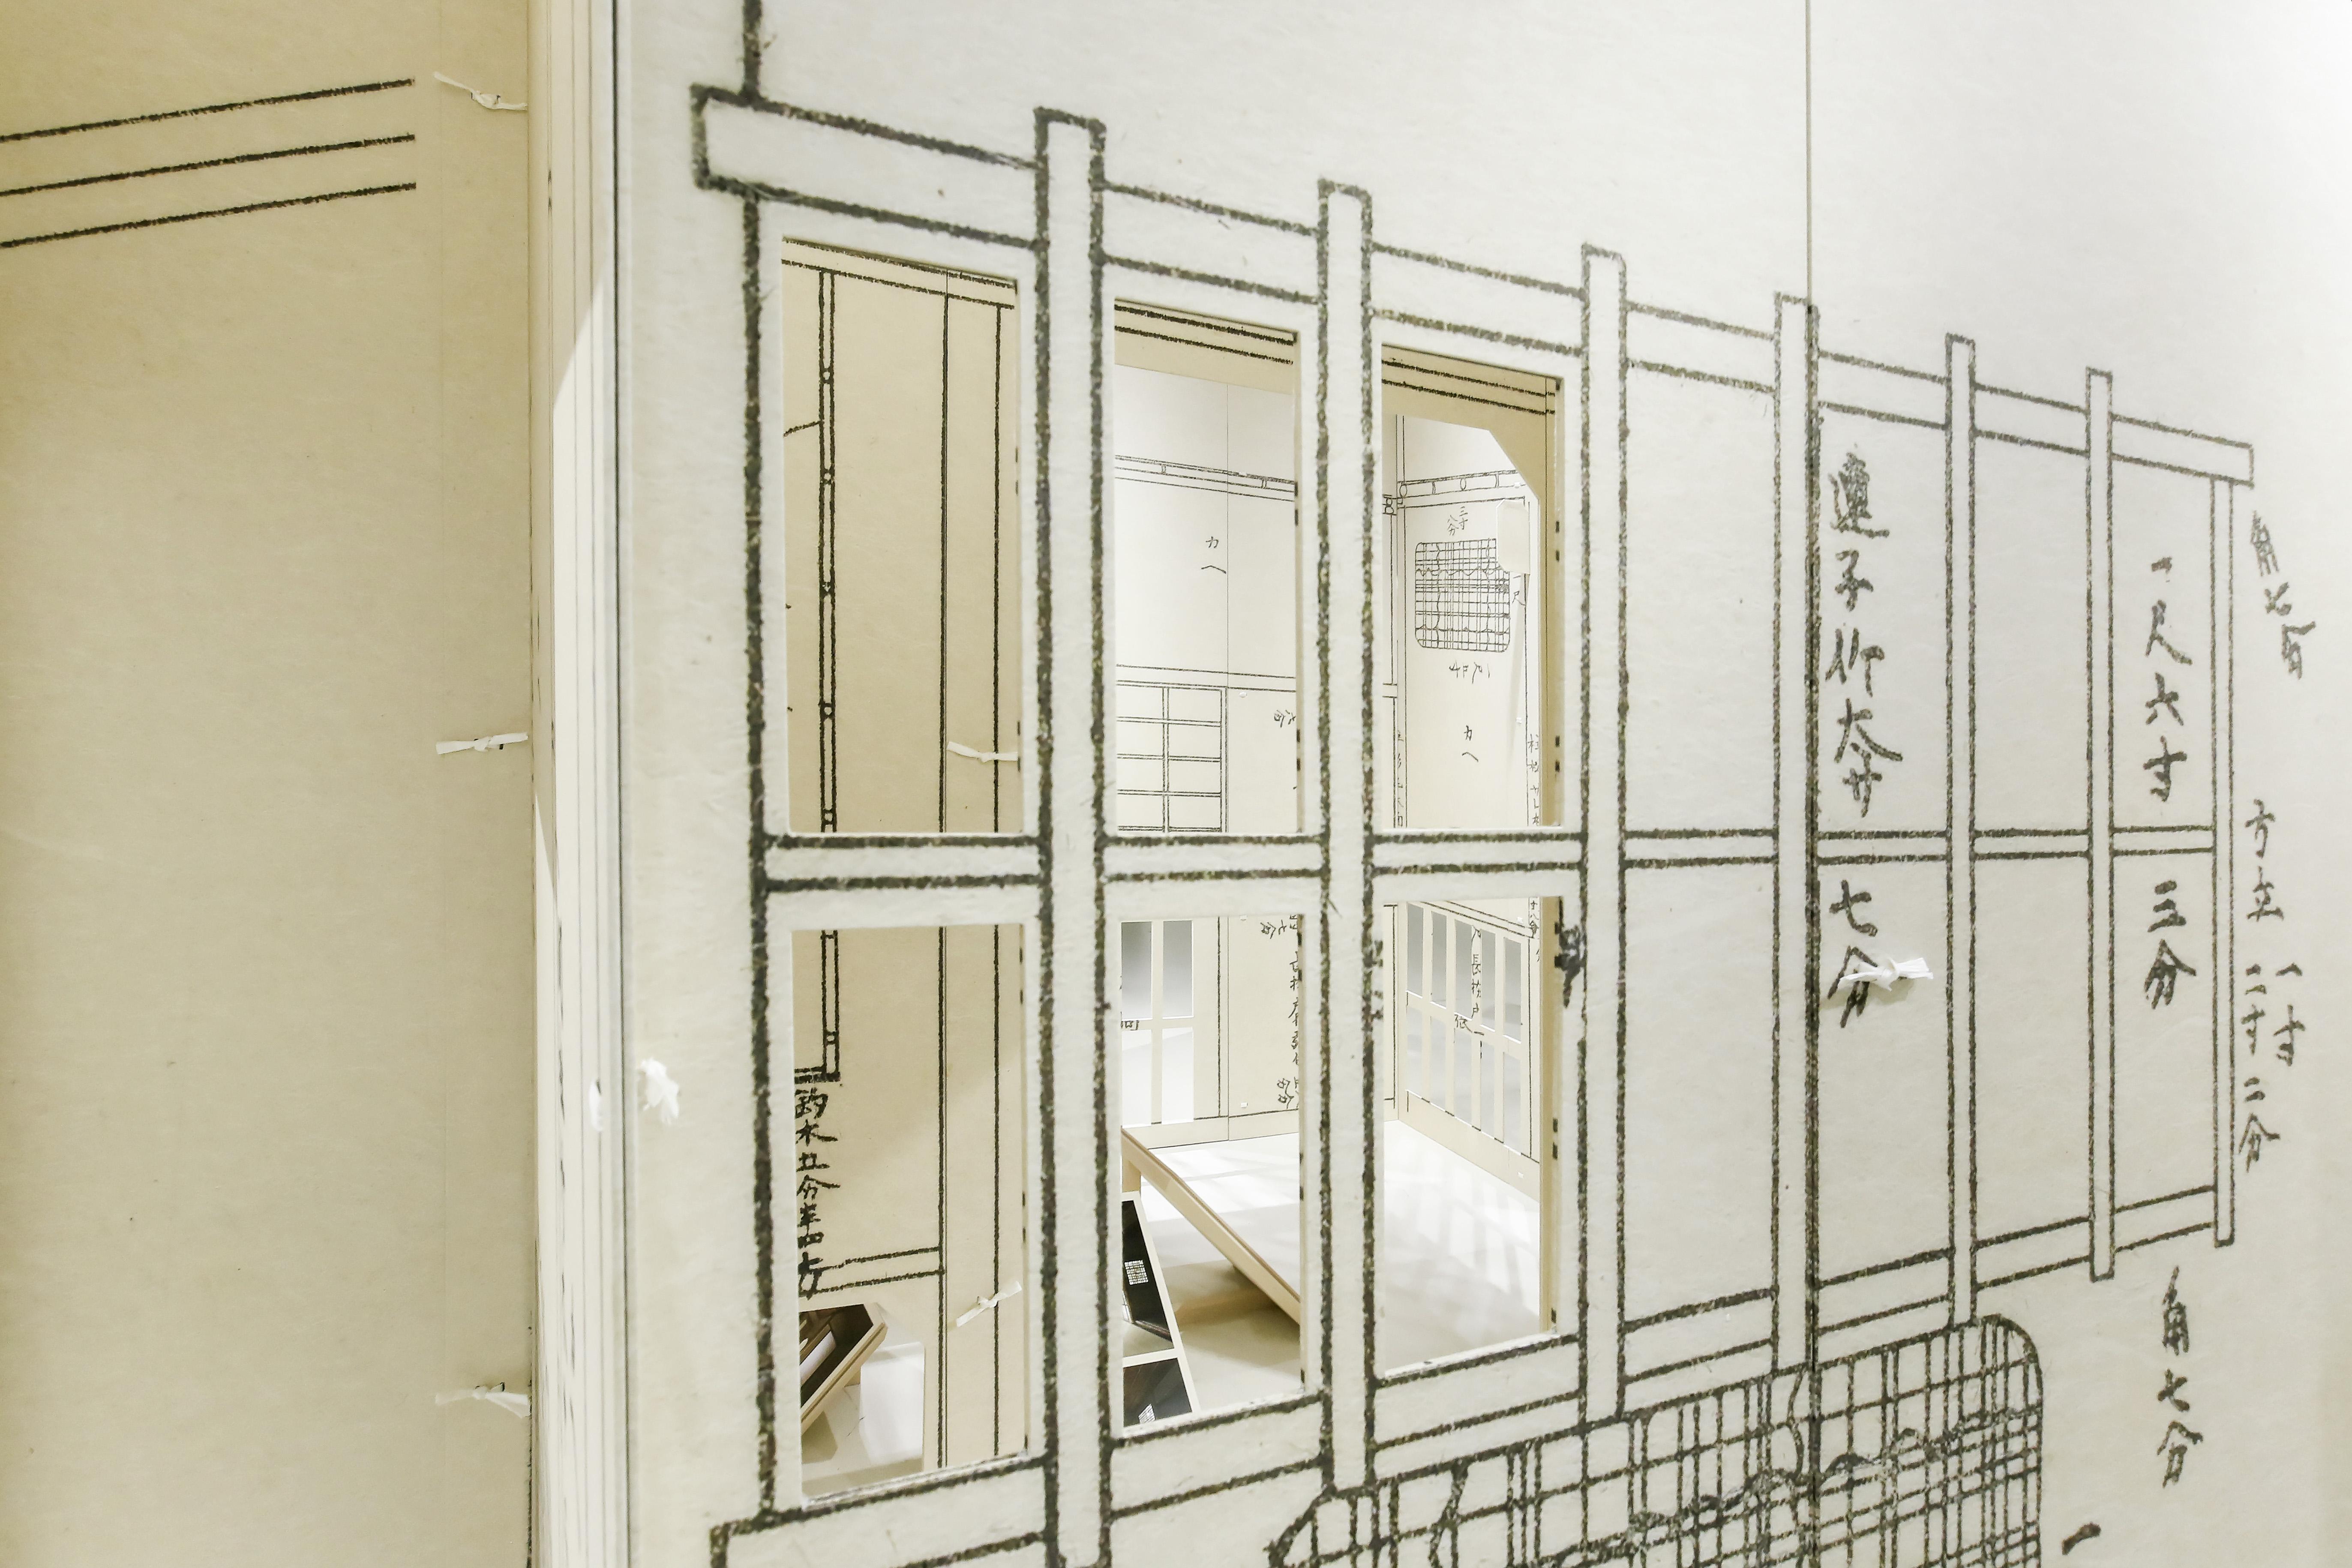 japan house Windowology: Estudo de janelas no Japão